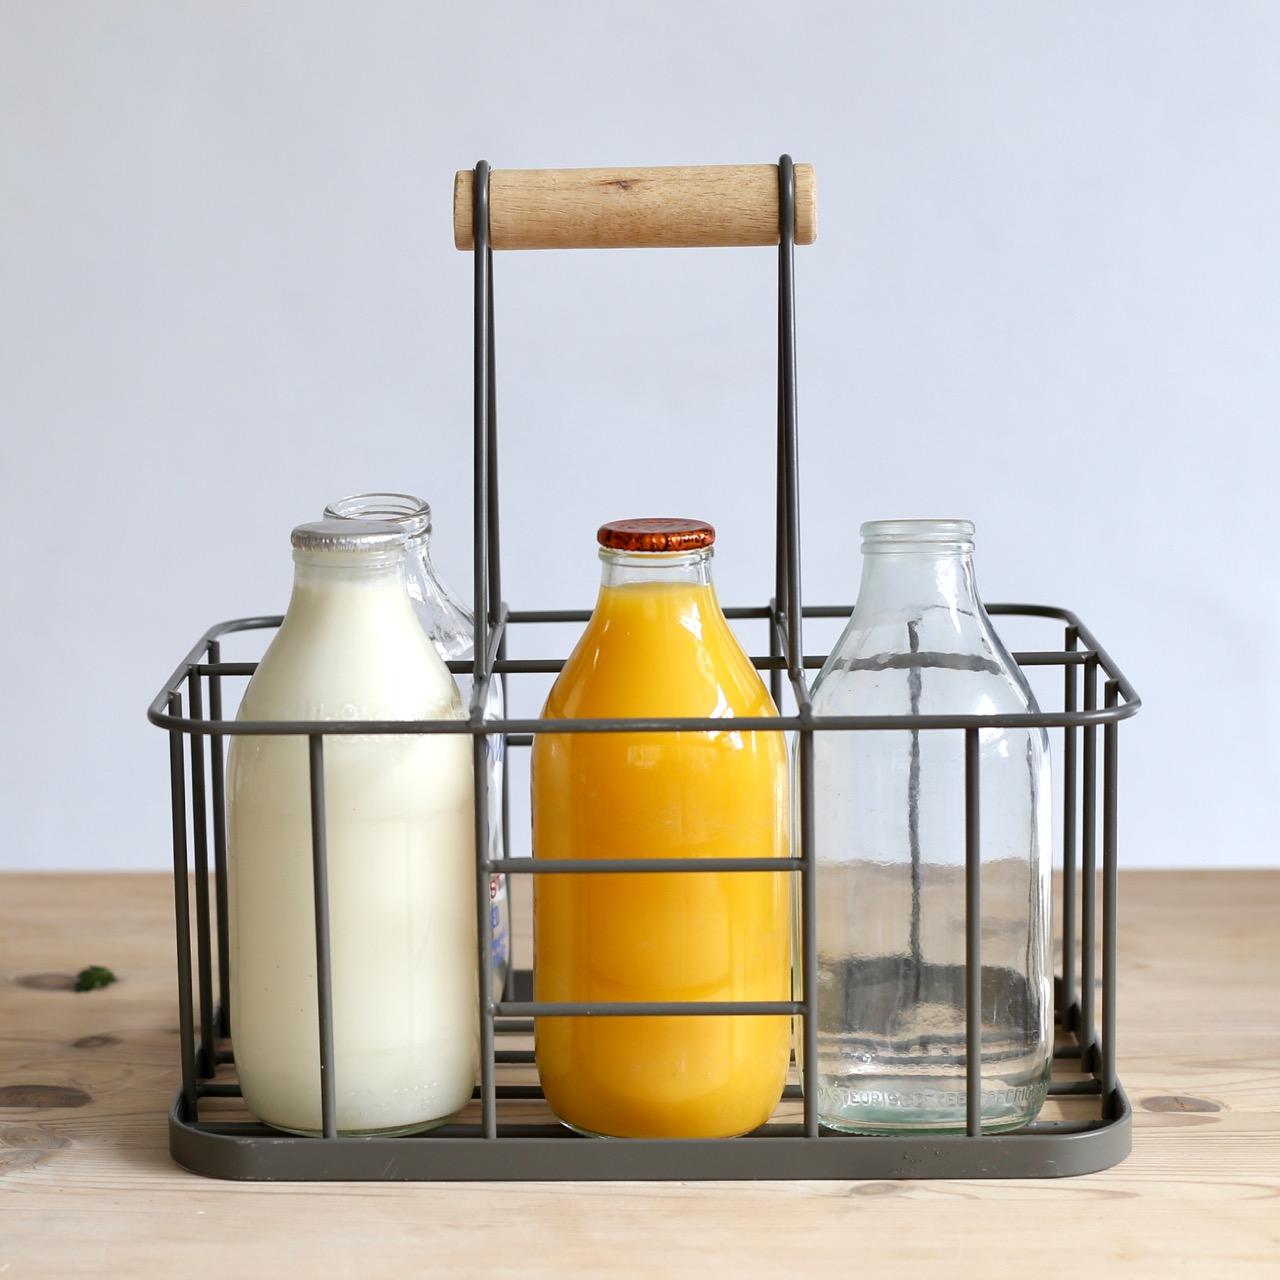 Milk in glass bottles